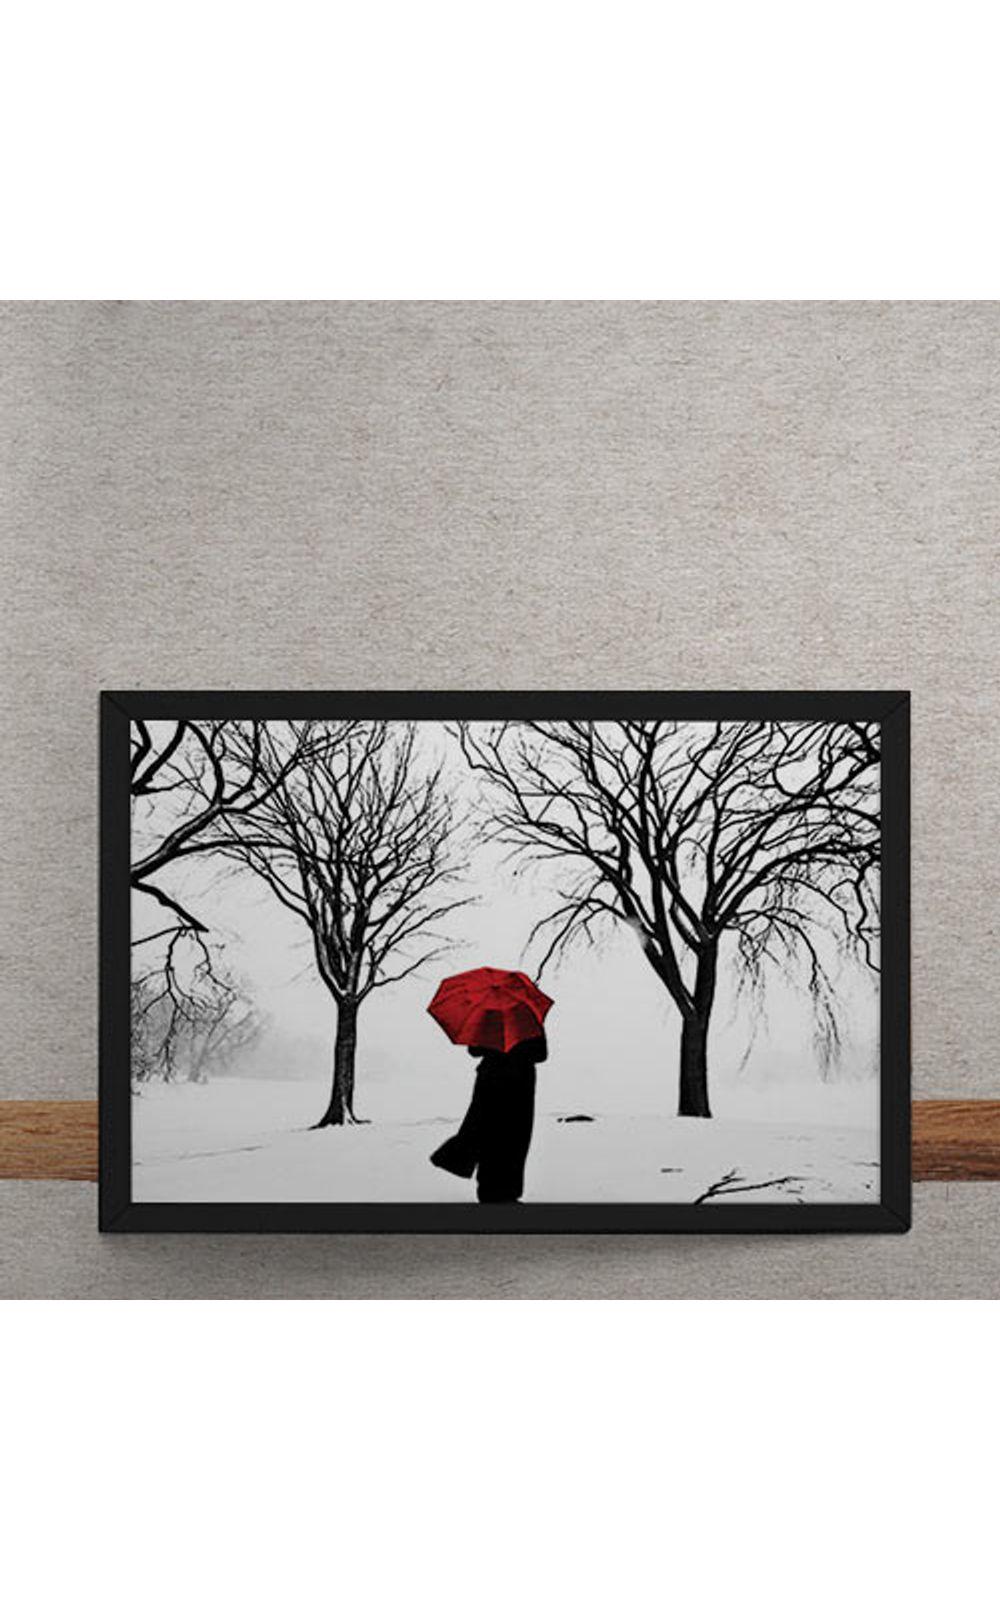 Foto 3 - Quadro Decorativo Guarda Chuva Vermelho na Neve